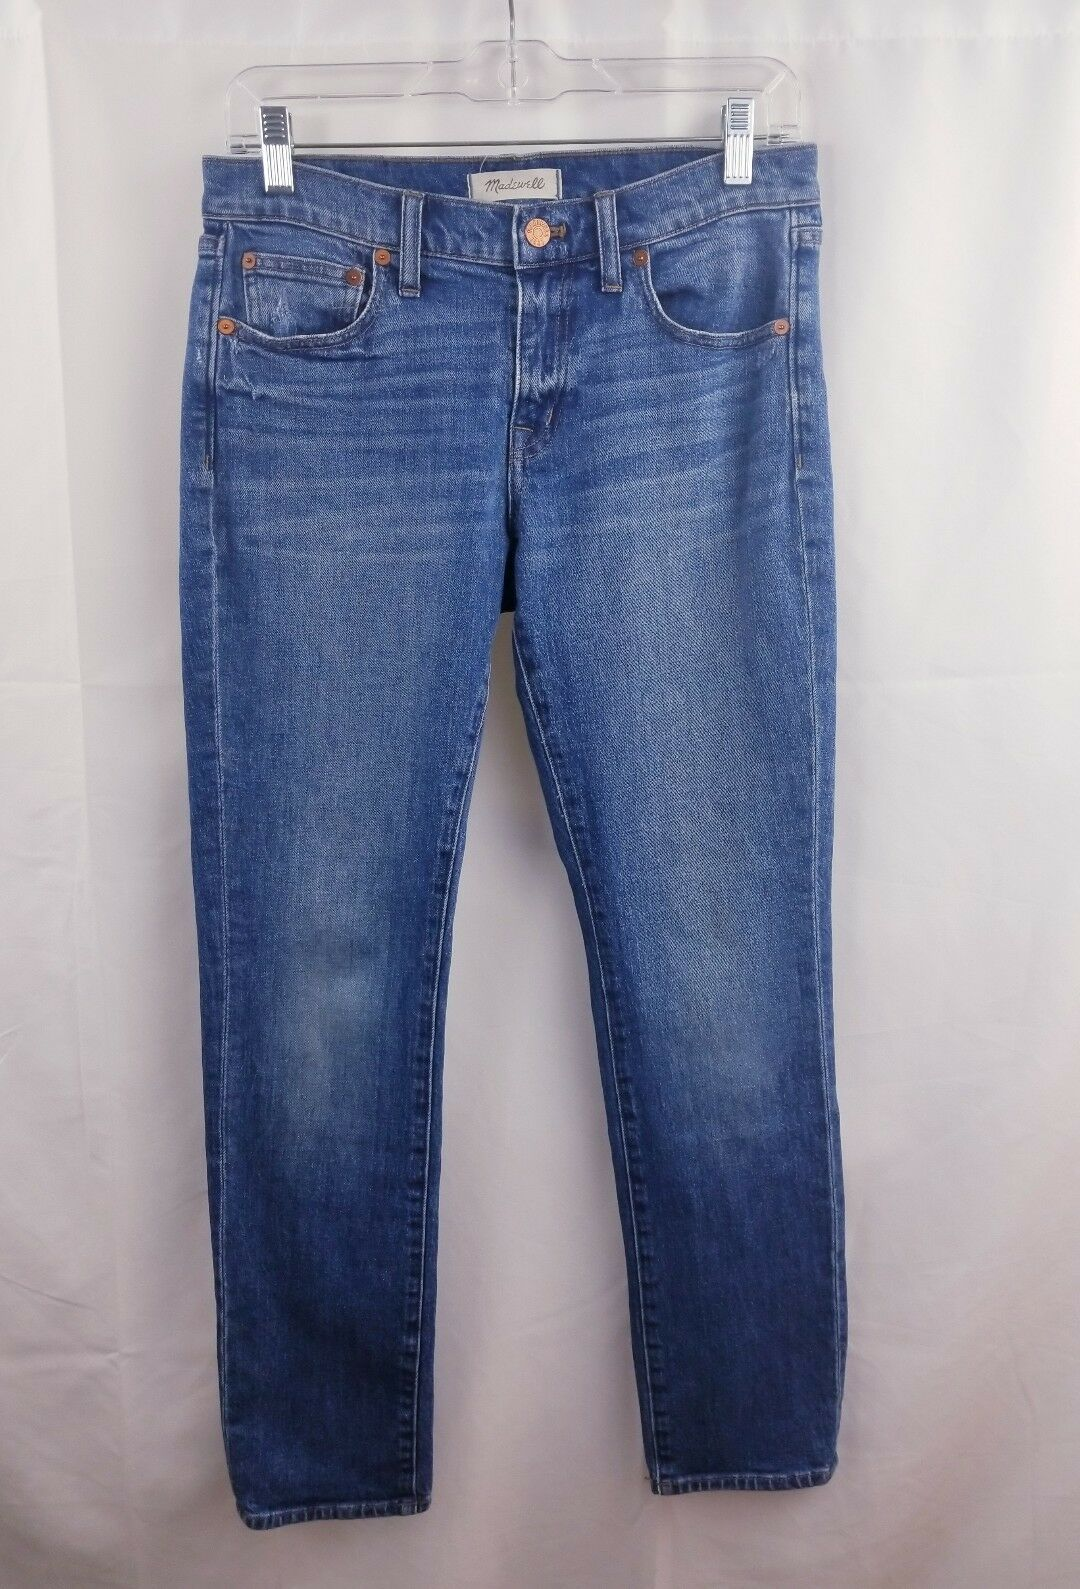 Madewell the slim boyfriend size 25 women jeans medium wash size 25 distressed